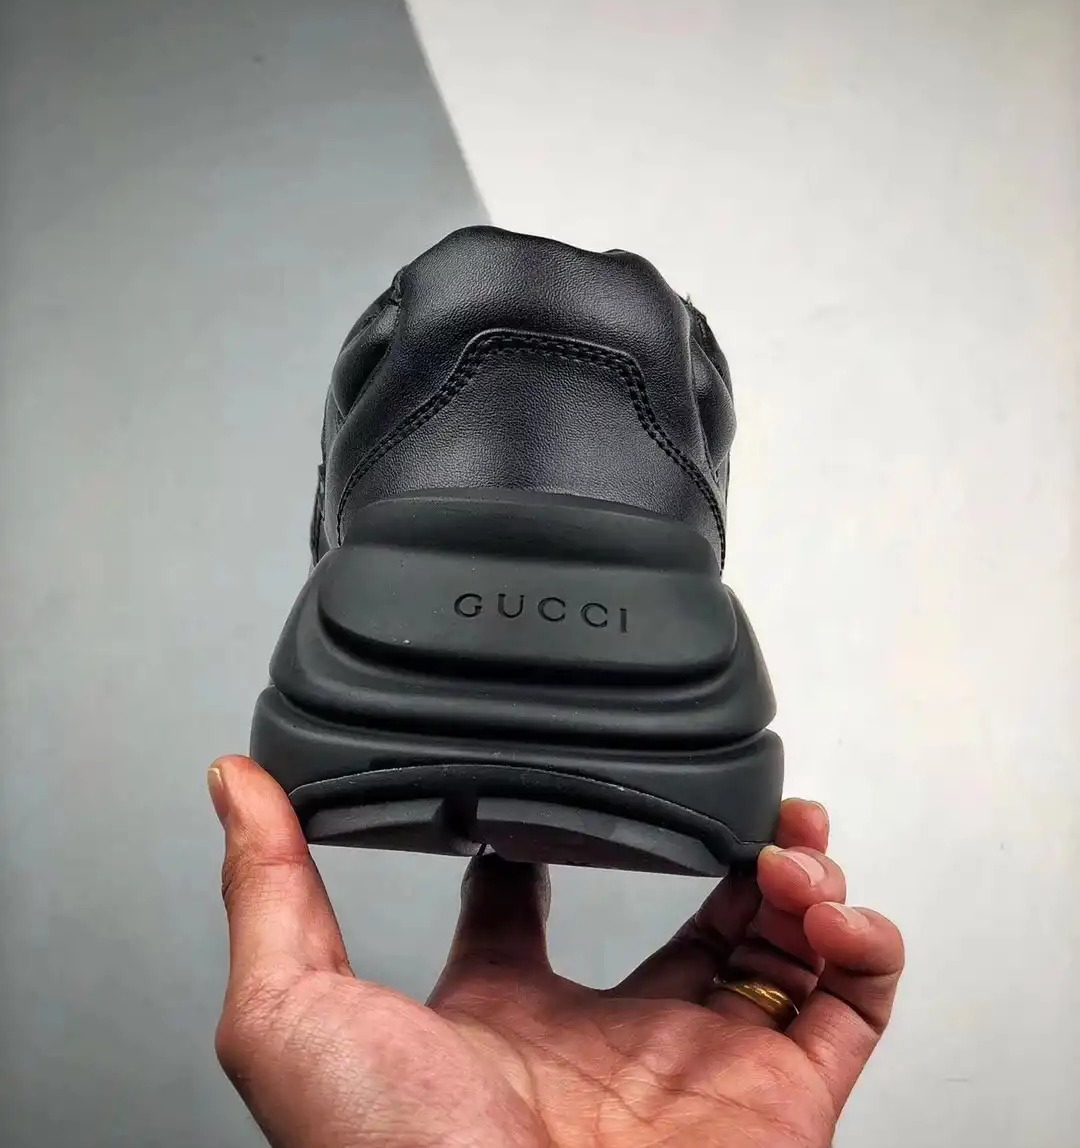 c46ac353653 gucci rhyton black puro 35 44 a pedido venta online. Cargando zoom.